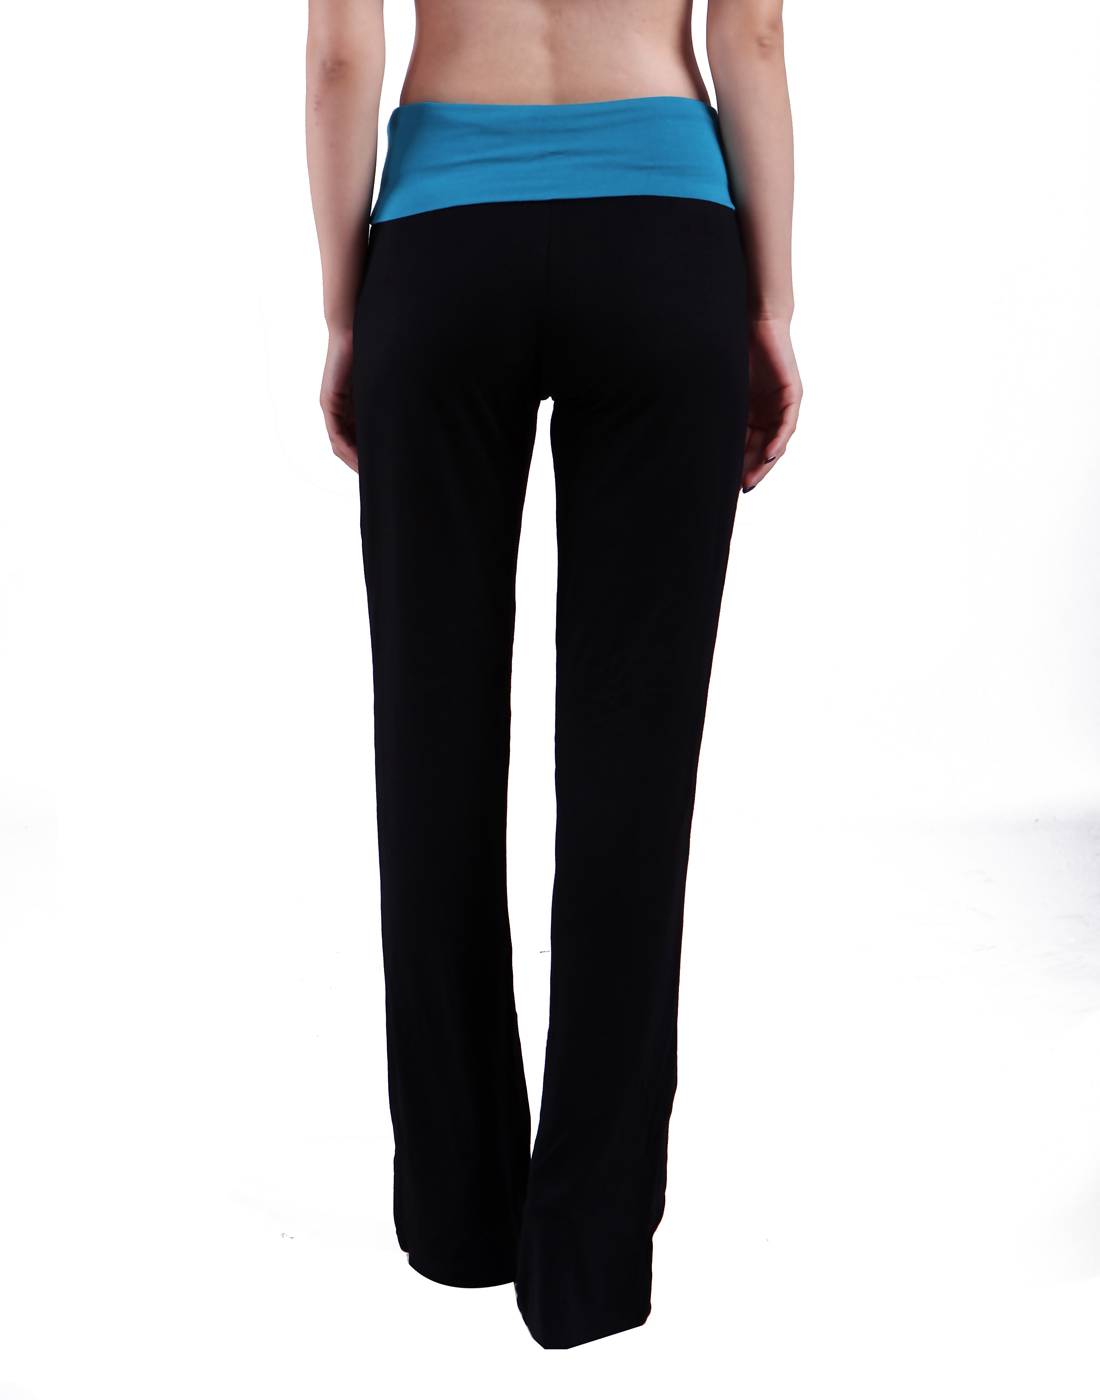 bd523c39fc HDE Women's Color Block Fold Over Waist Yoga Pants Flare Leg Workout  Leggings (X-Large, Hot Pink)